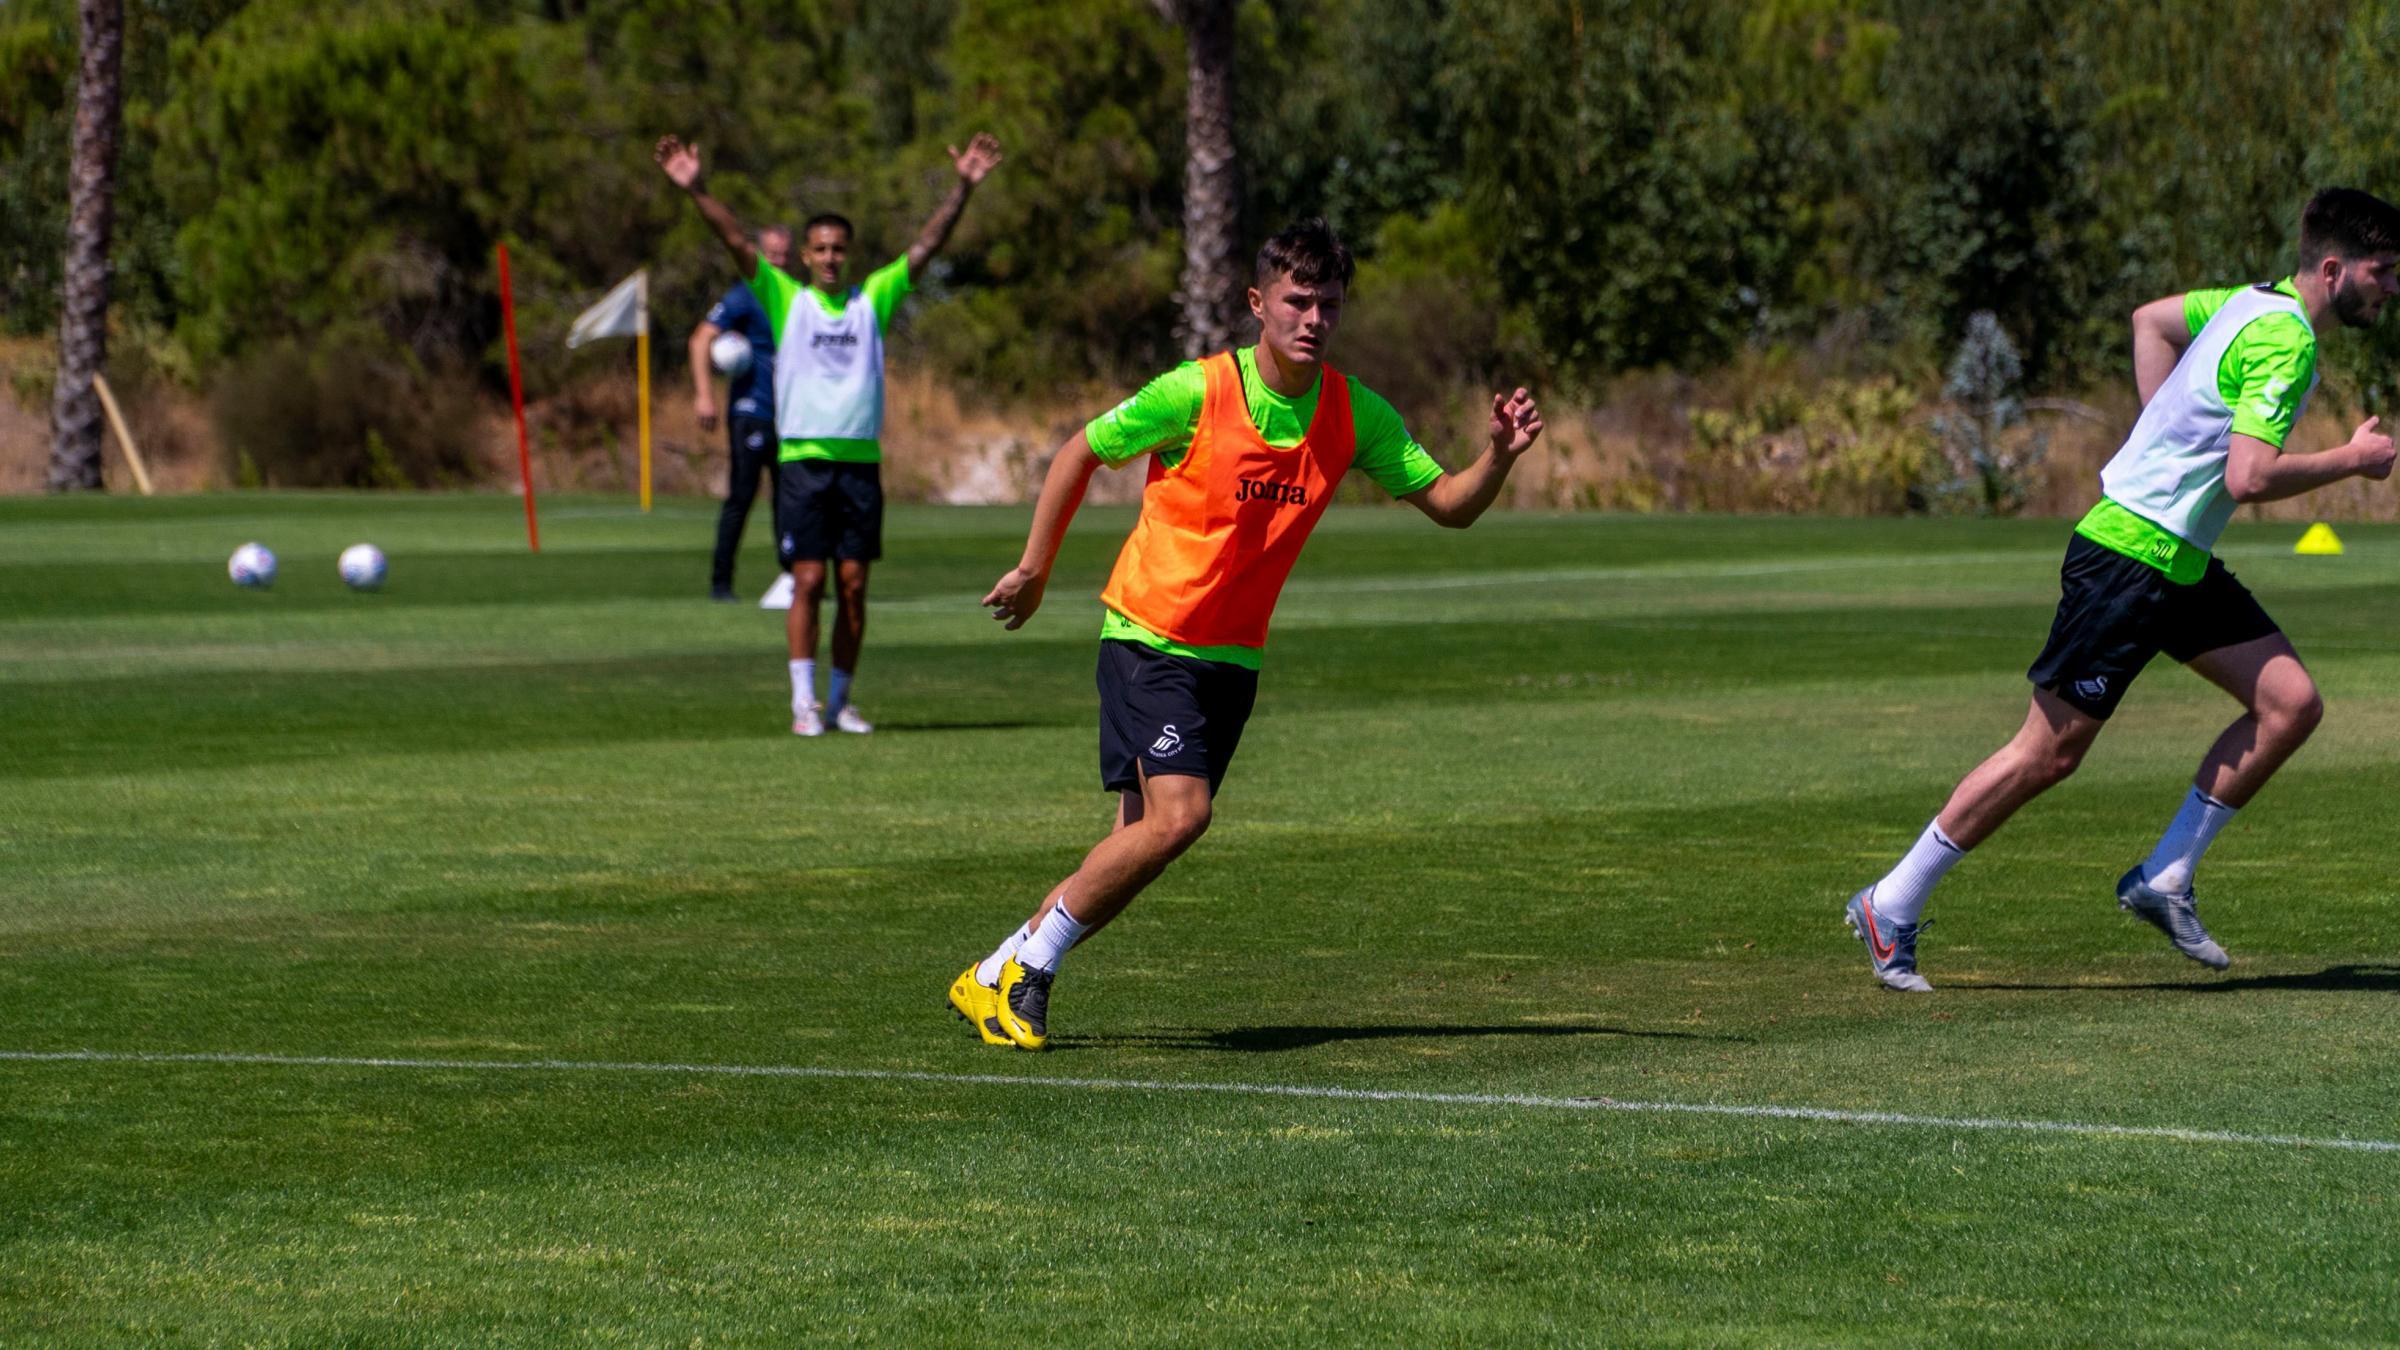 Liam Cullen training in Spain